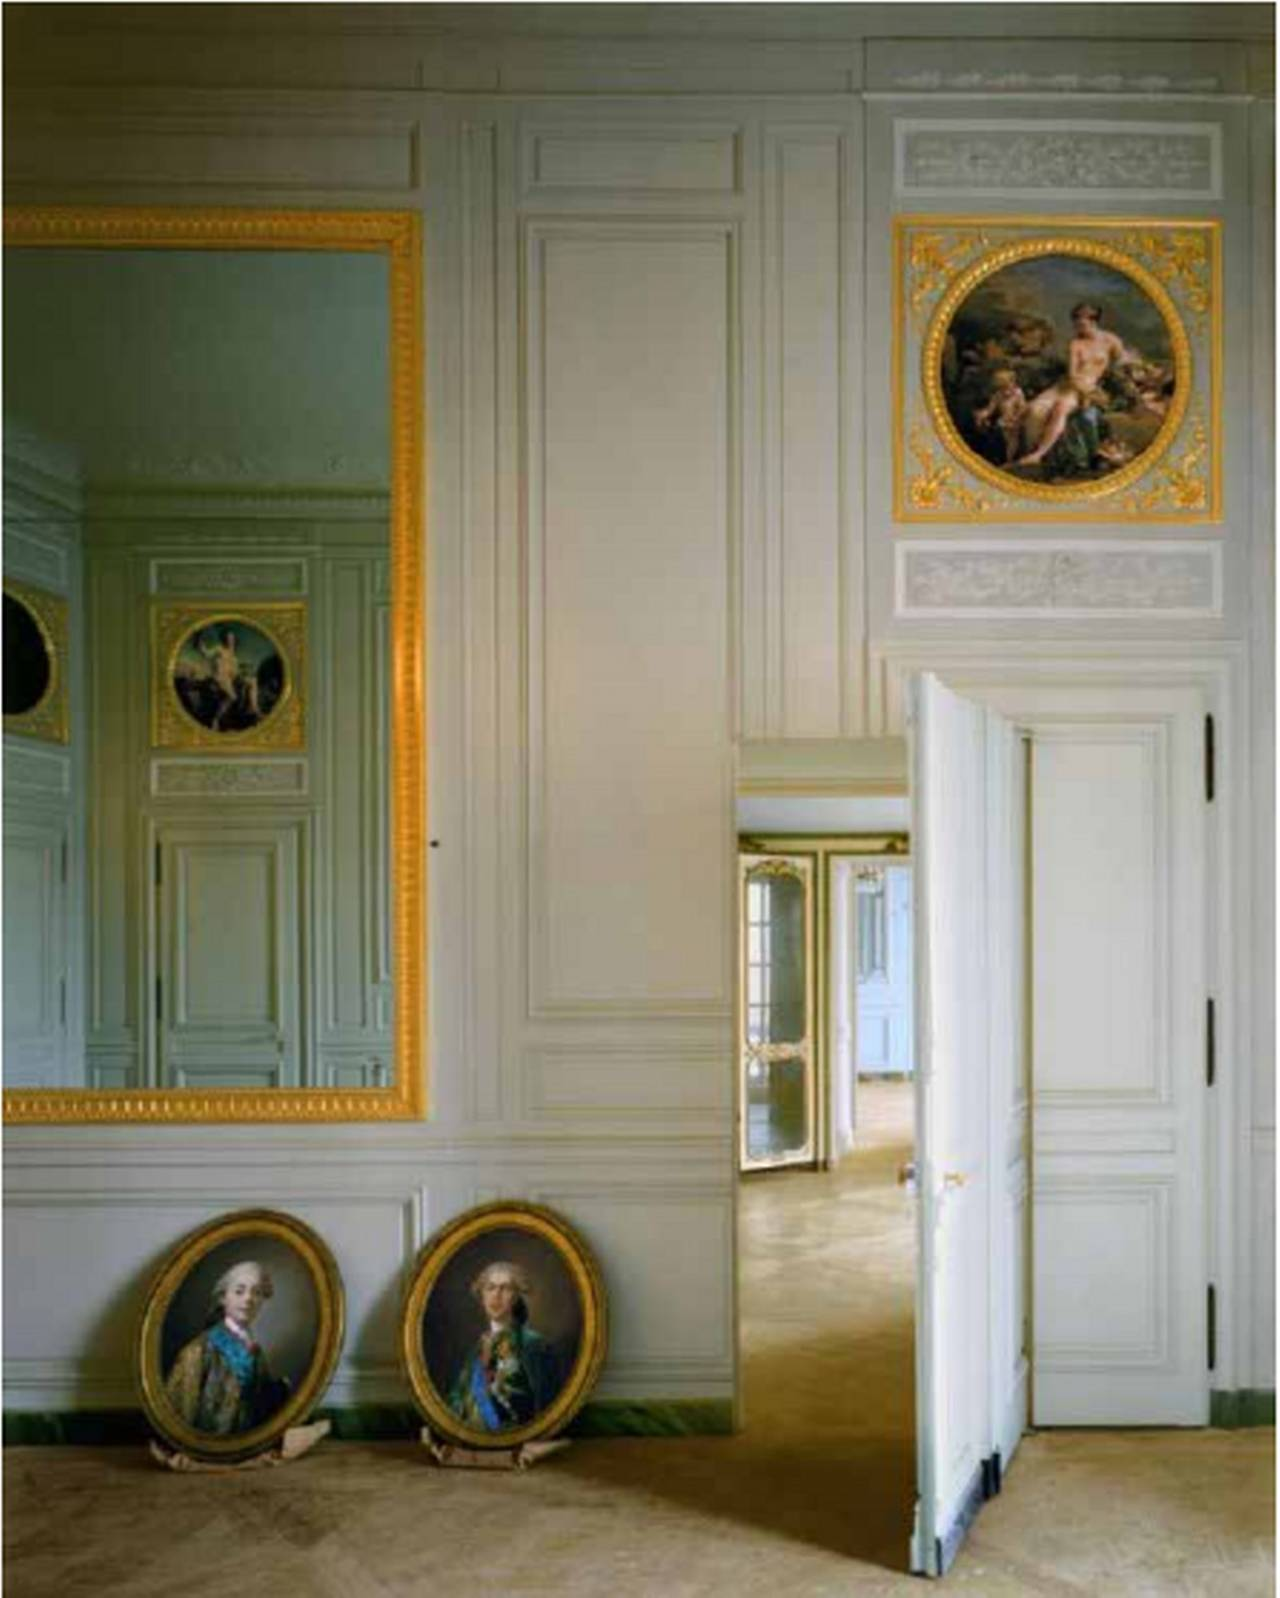 Robert Polidori, <i>Cabinet intérieur de Madame Adélaïde, Château de Versailles</i>, 1986, offered by Preiss Fine Arts Photographers Limited Editions